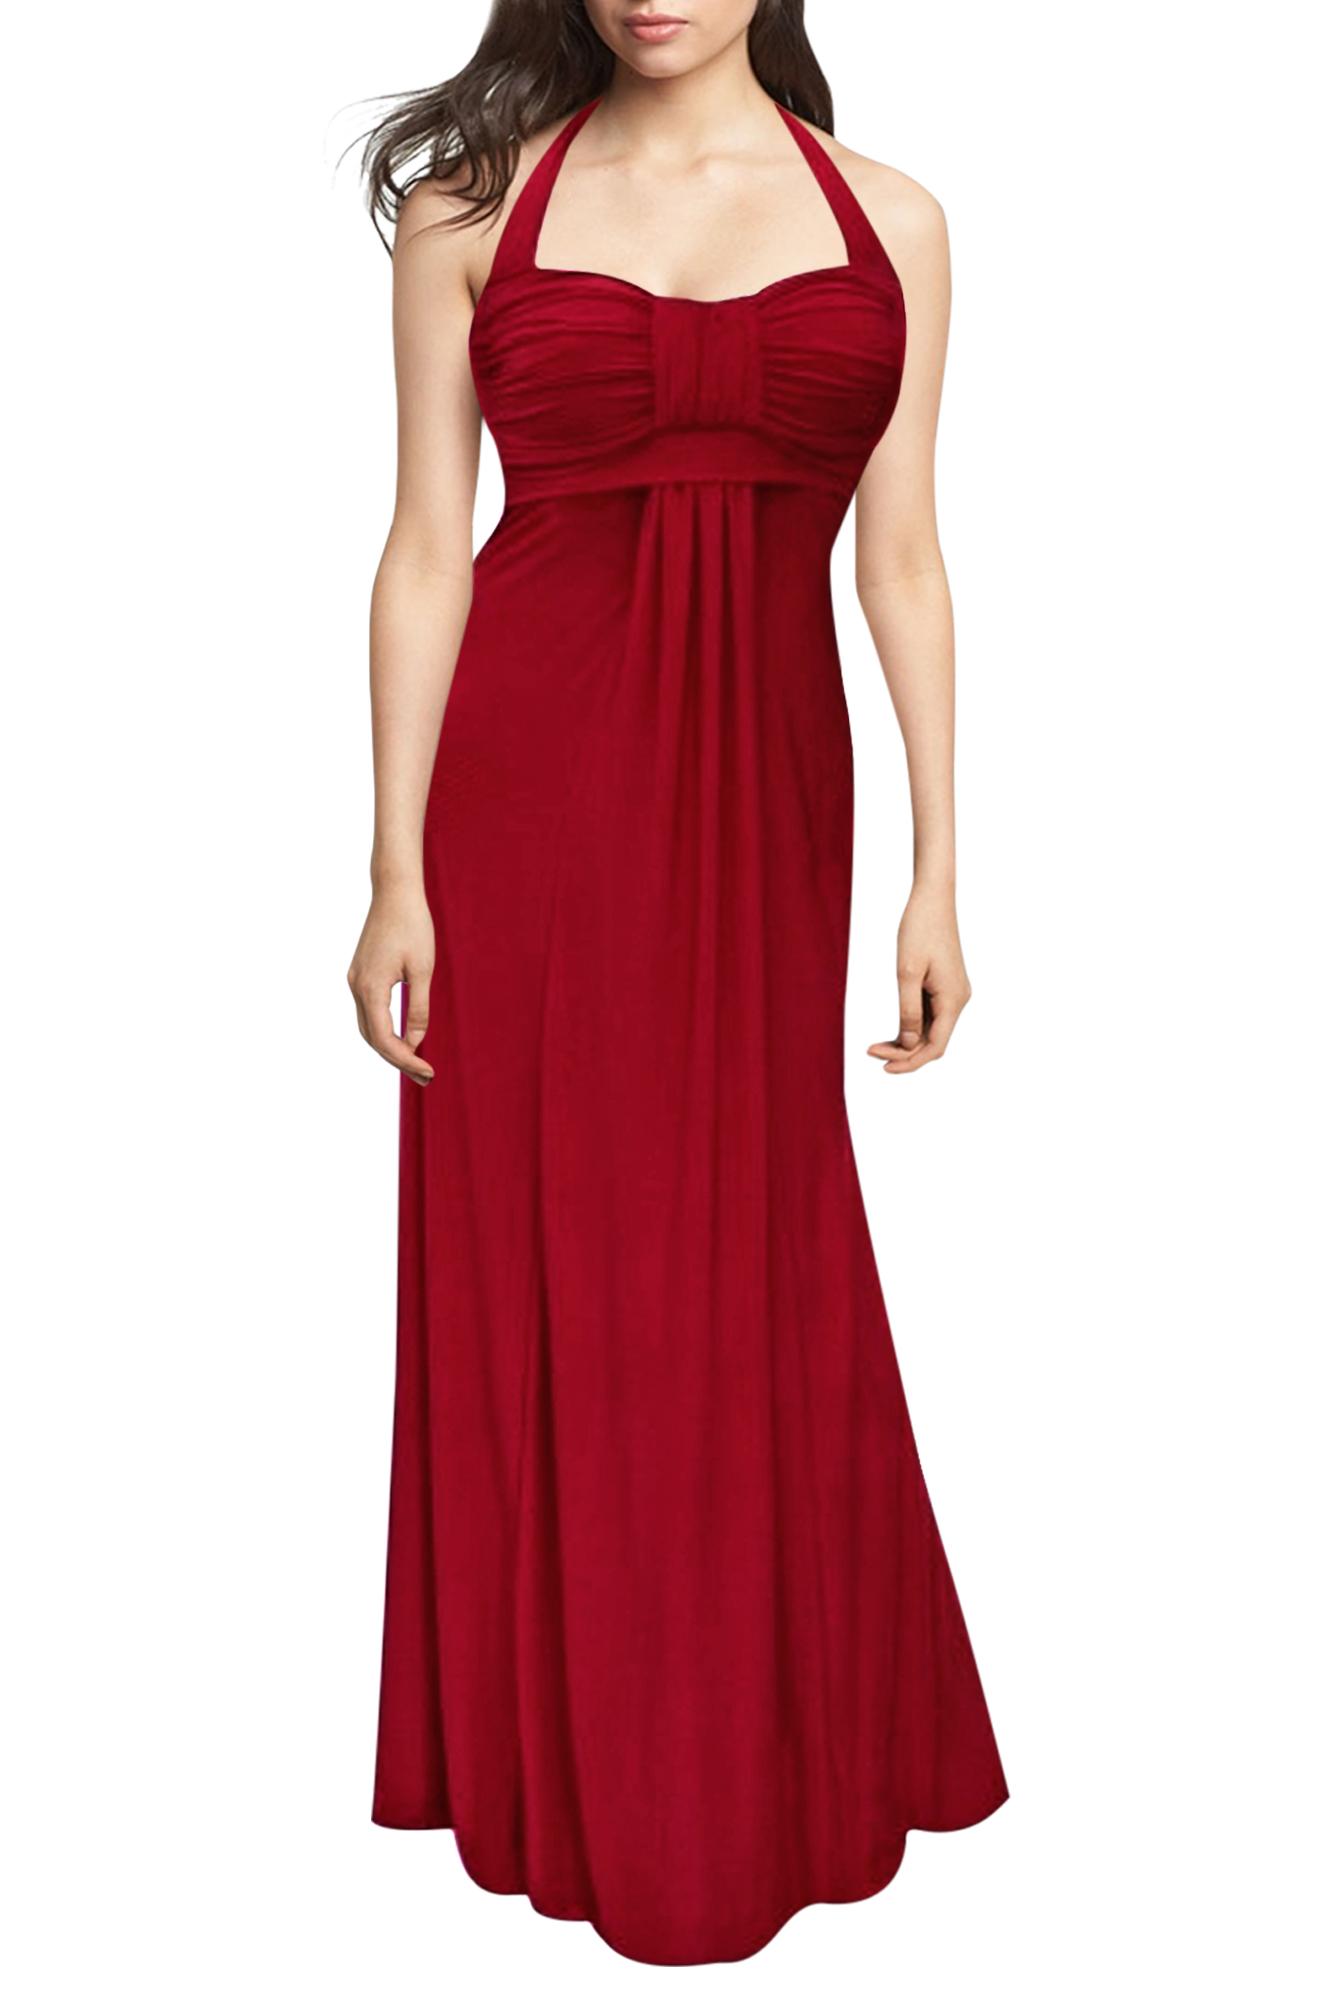 Long Elegant Wedding Evening Prom Maxi Dress Size 12 24